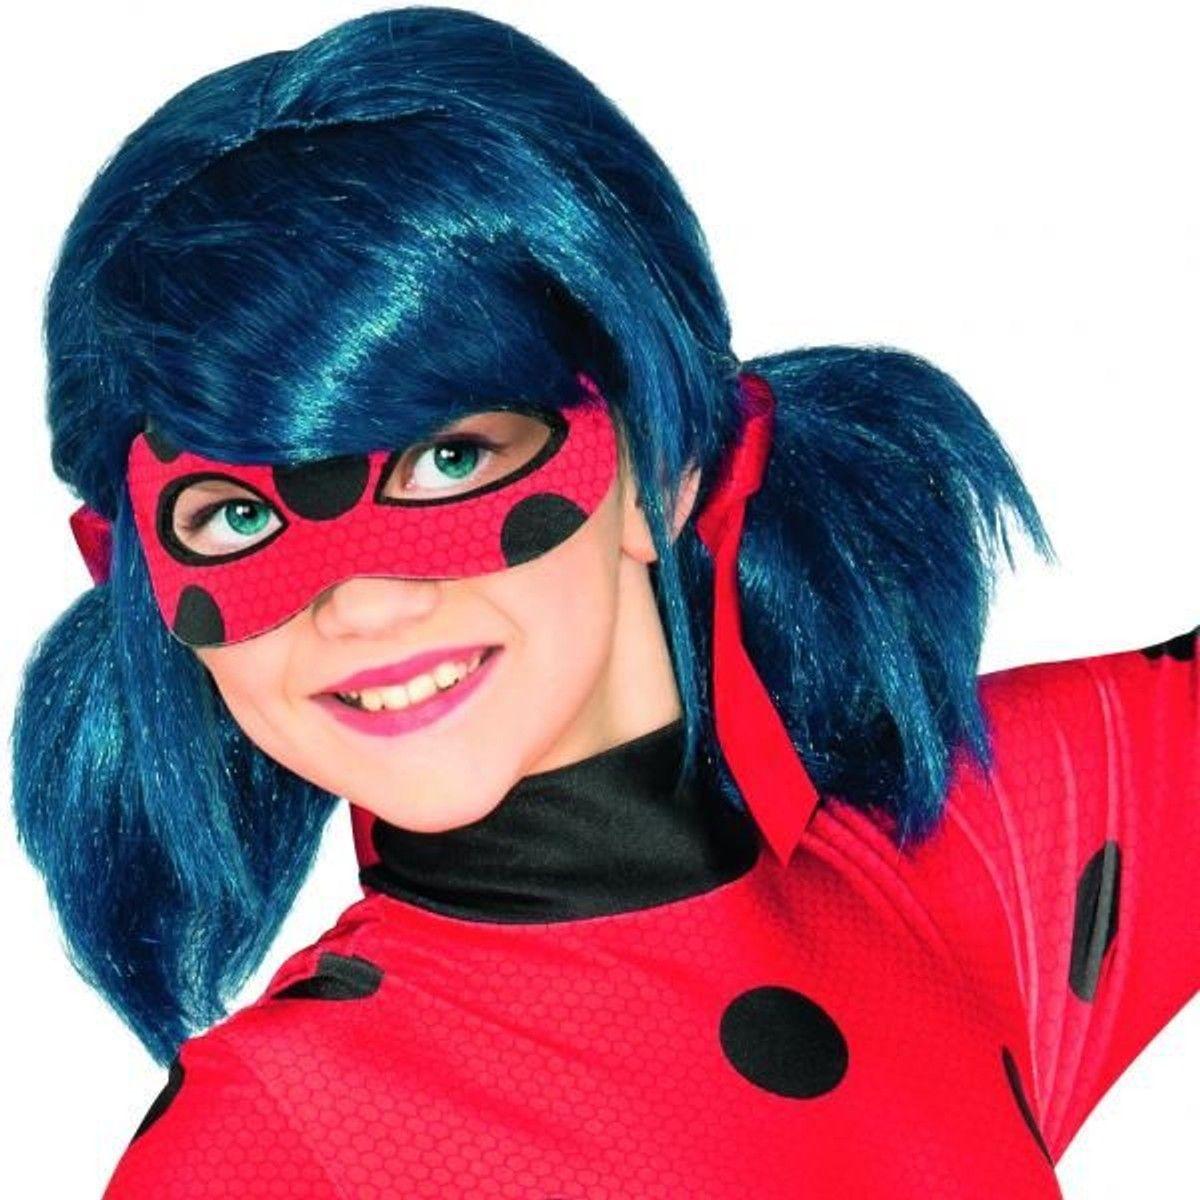 Filles officiel miraculeuse Ladybug Fancy Dress Costume Super Héros Enfant Coccinelle